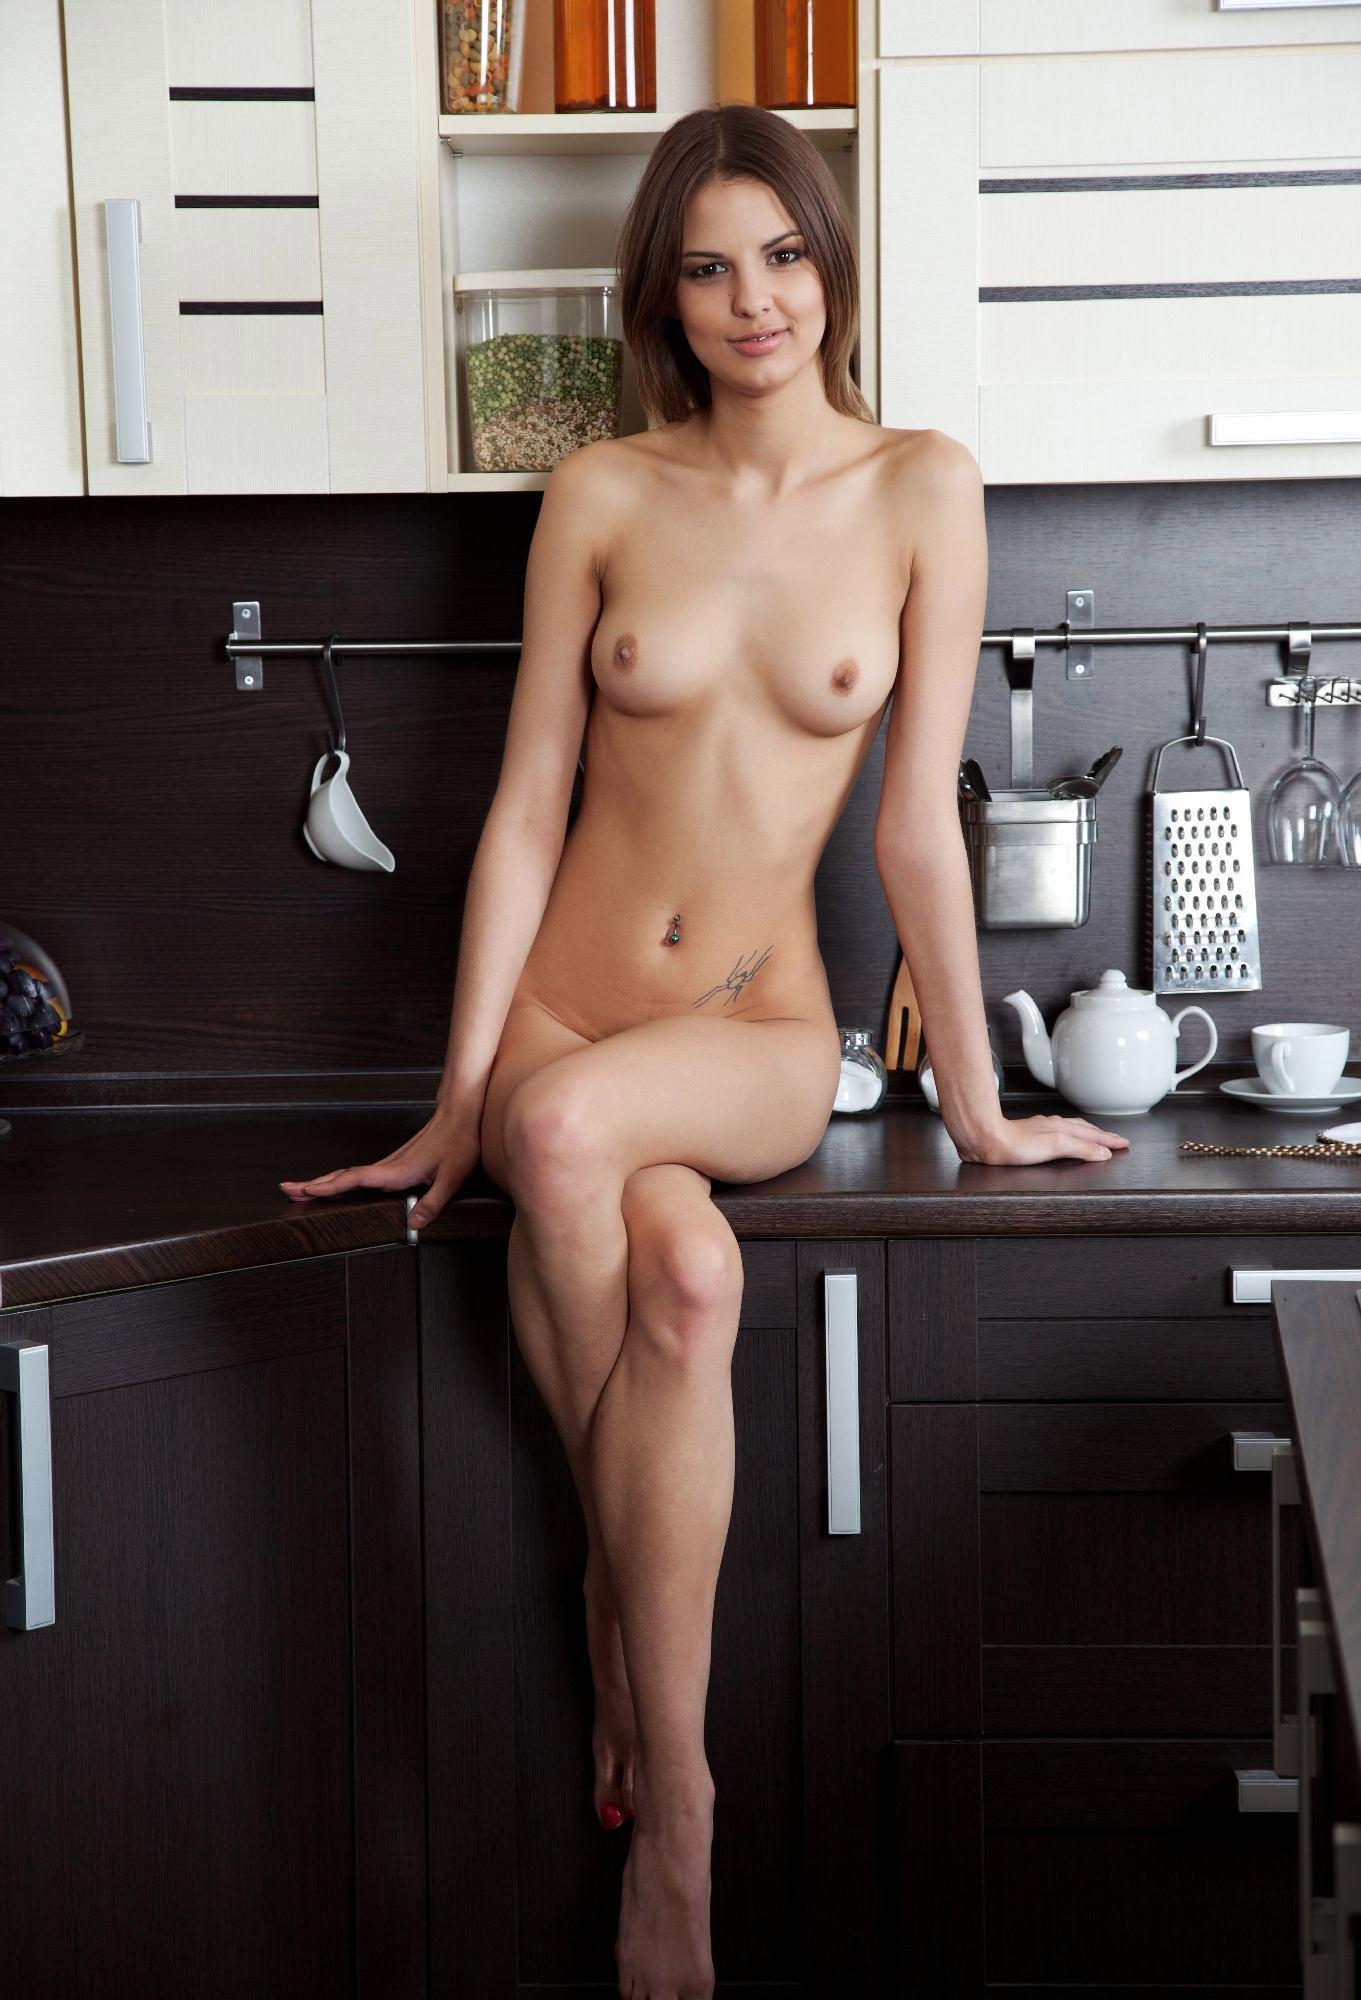 alli-hot-naked-kitchen-peeing-outdoor-brunette